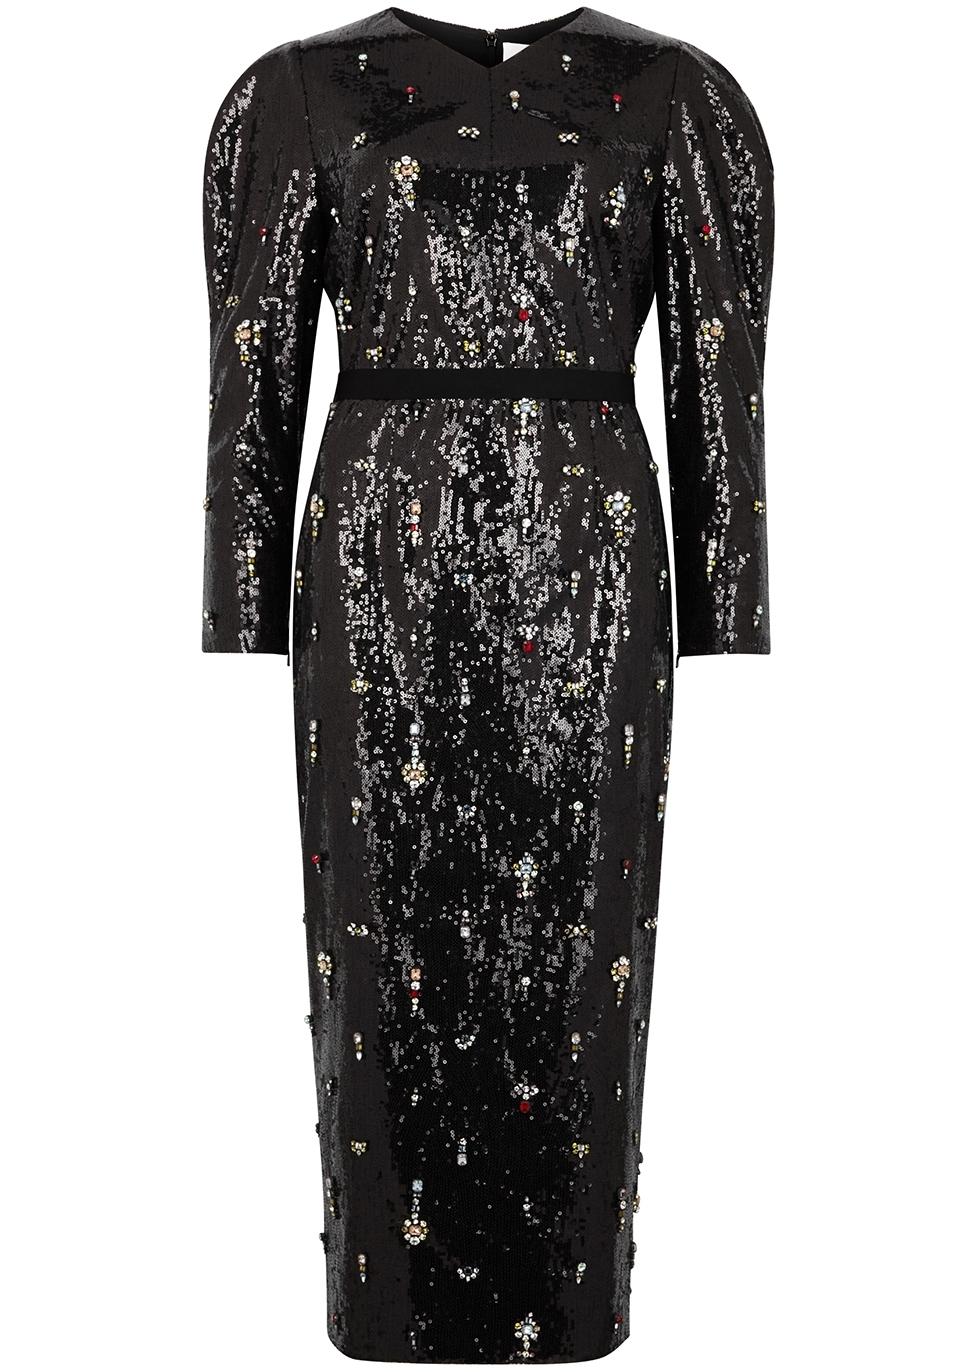 8c3b3fb8f0eb Erdem Emmy black embellished sequin dress - Harvey Nichols